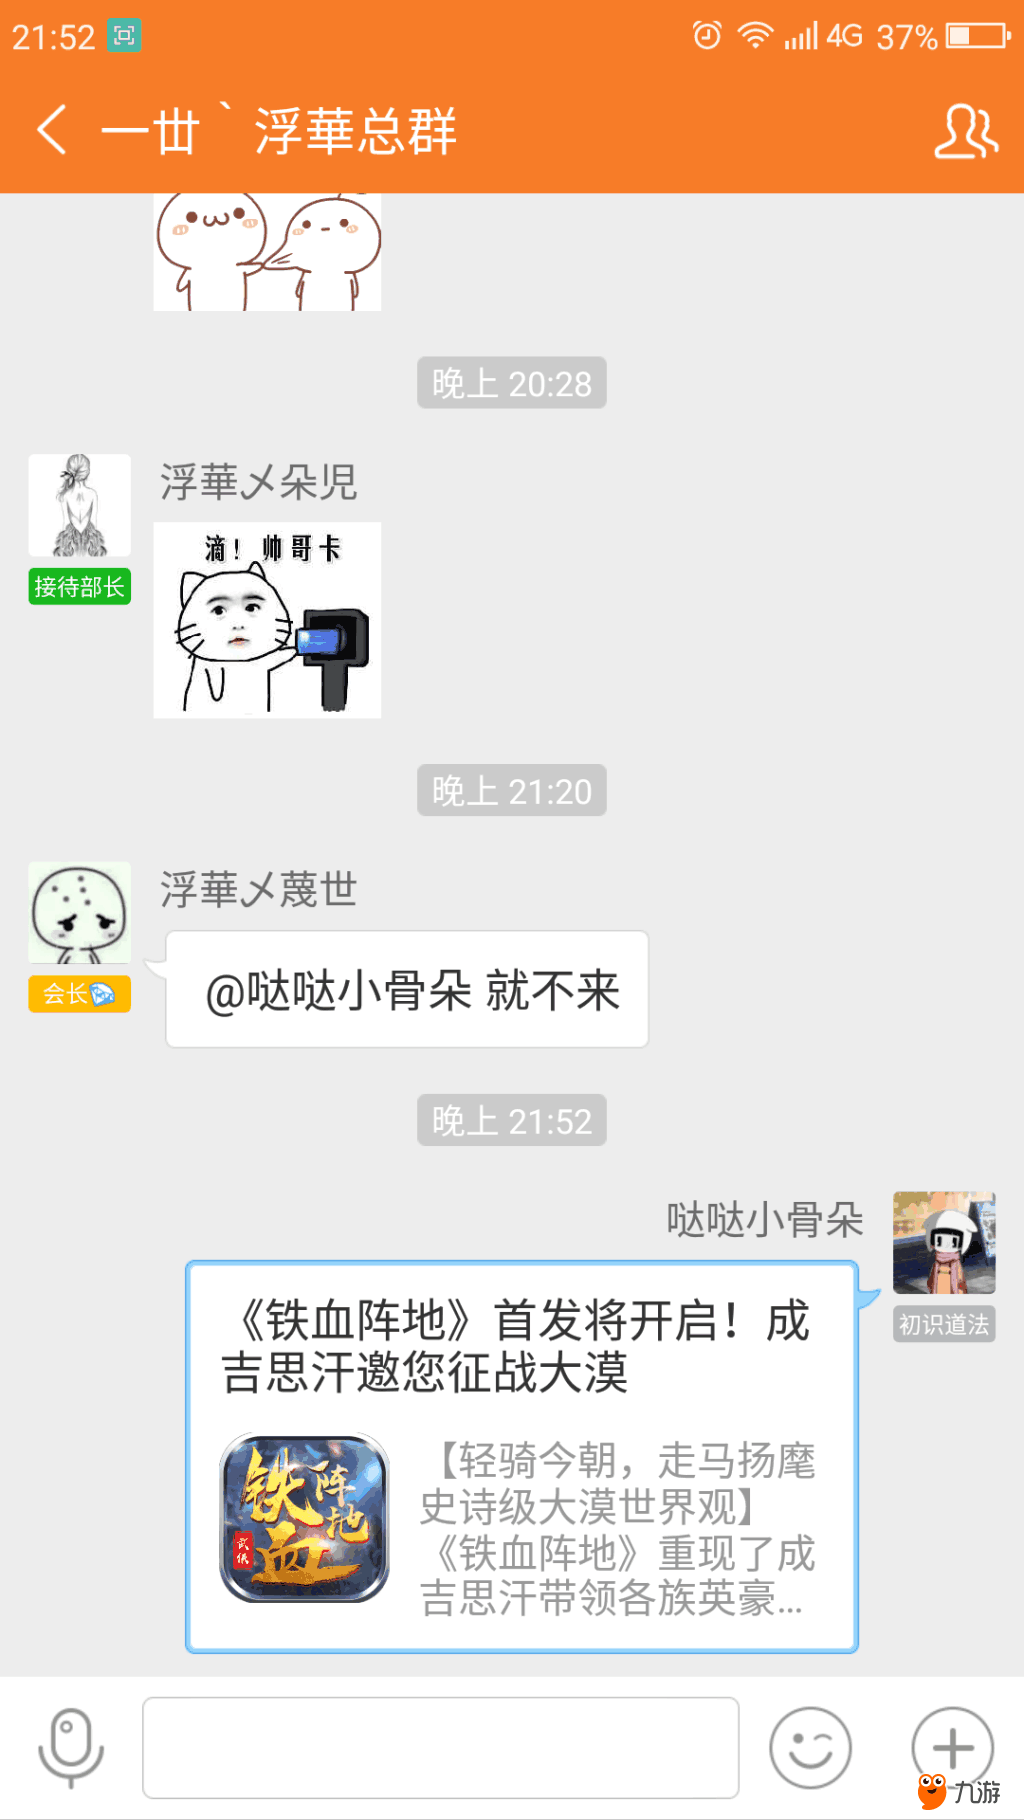 Screenshot_2018s07s15s21s52s59.png